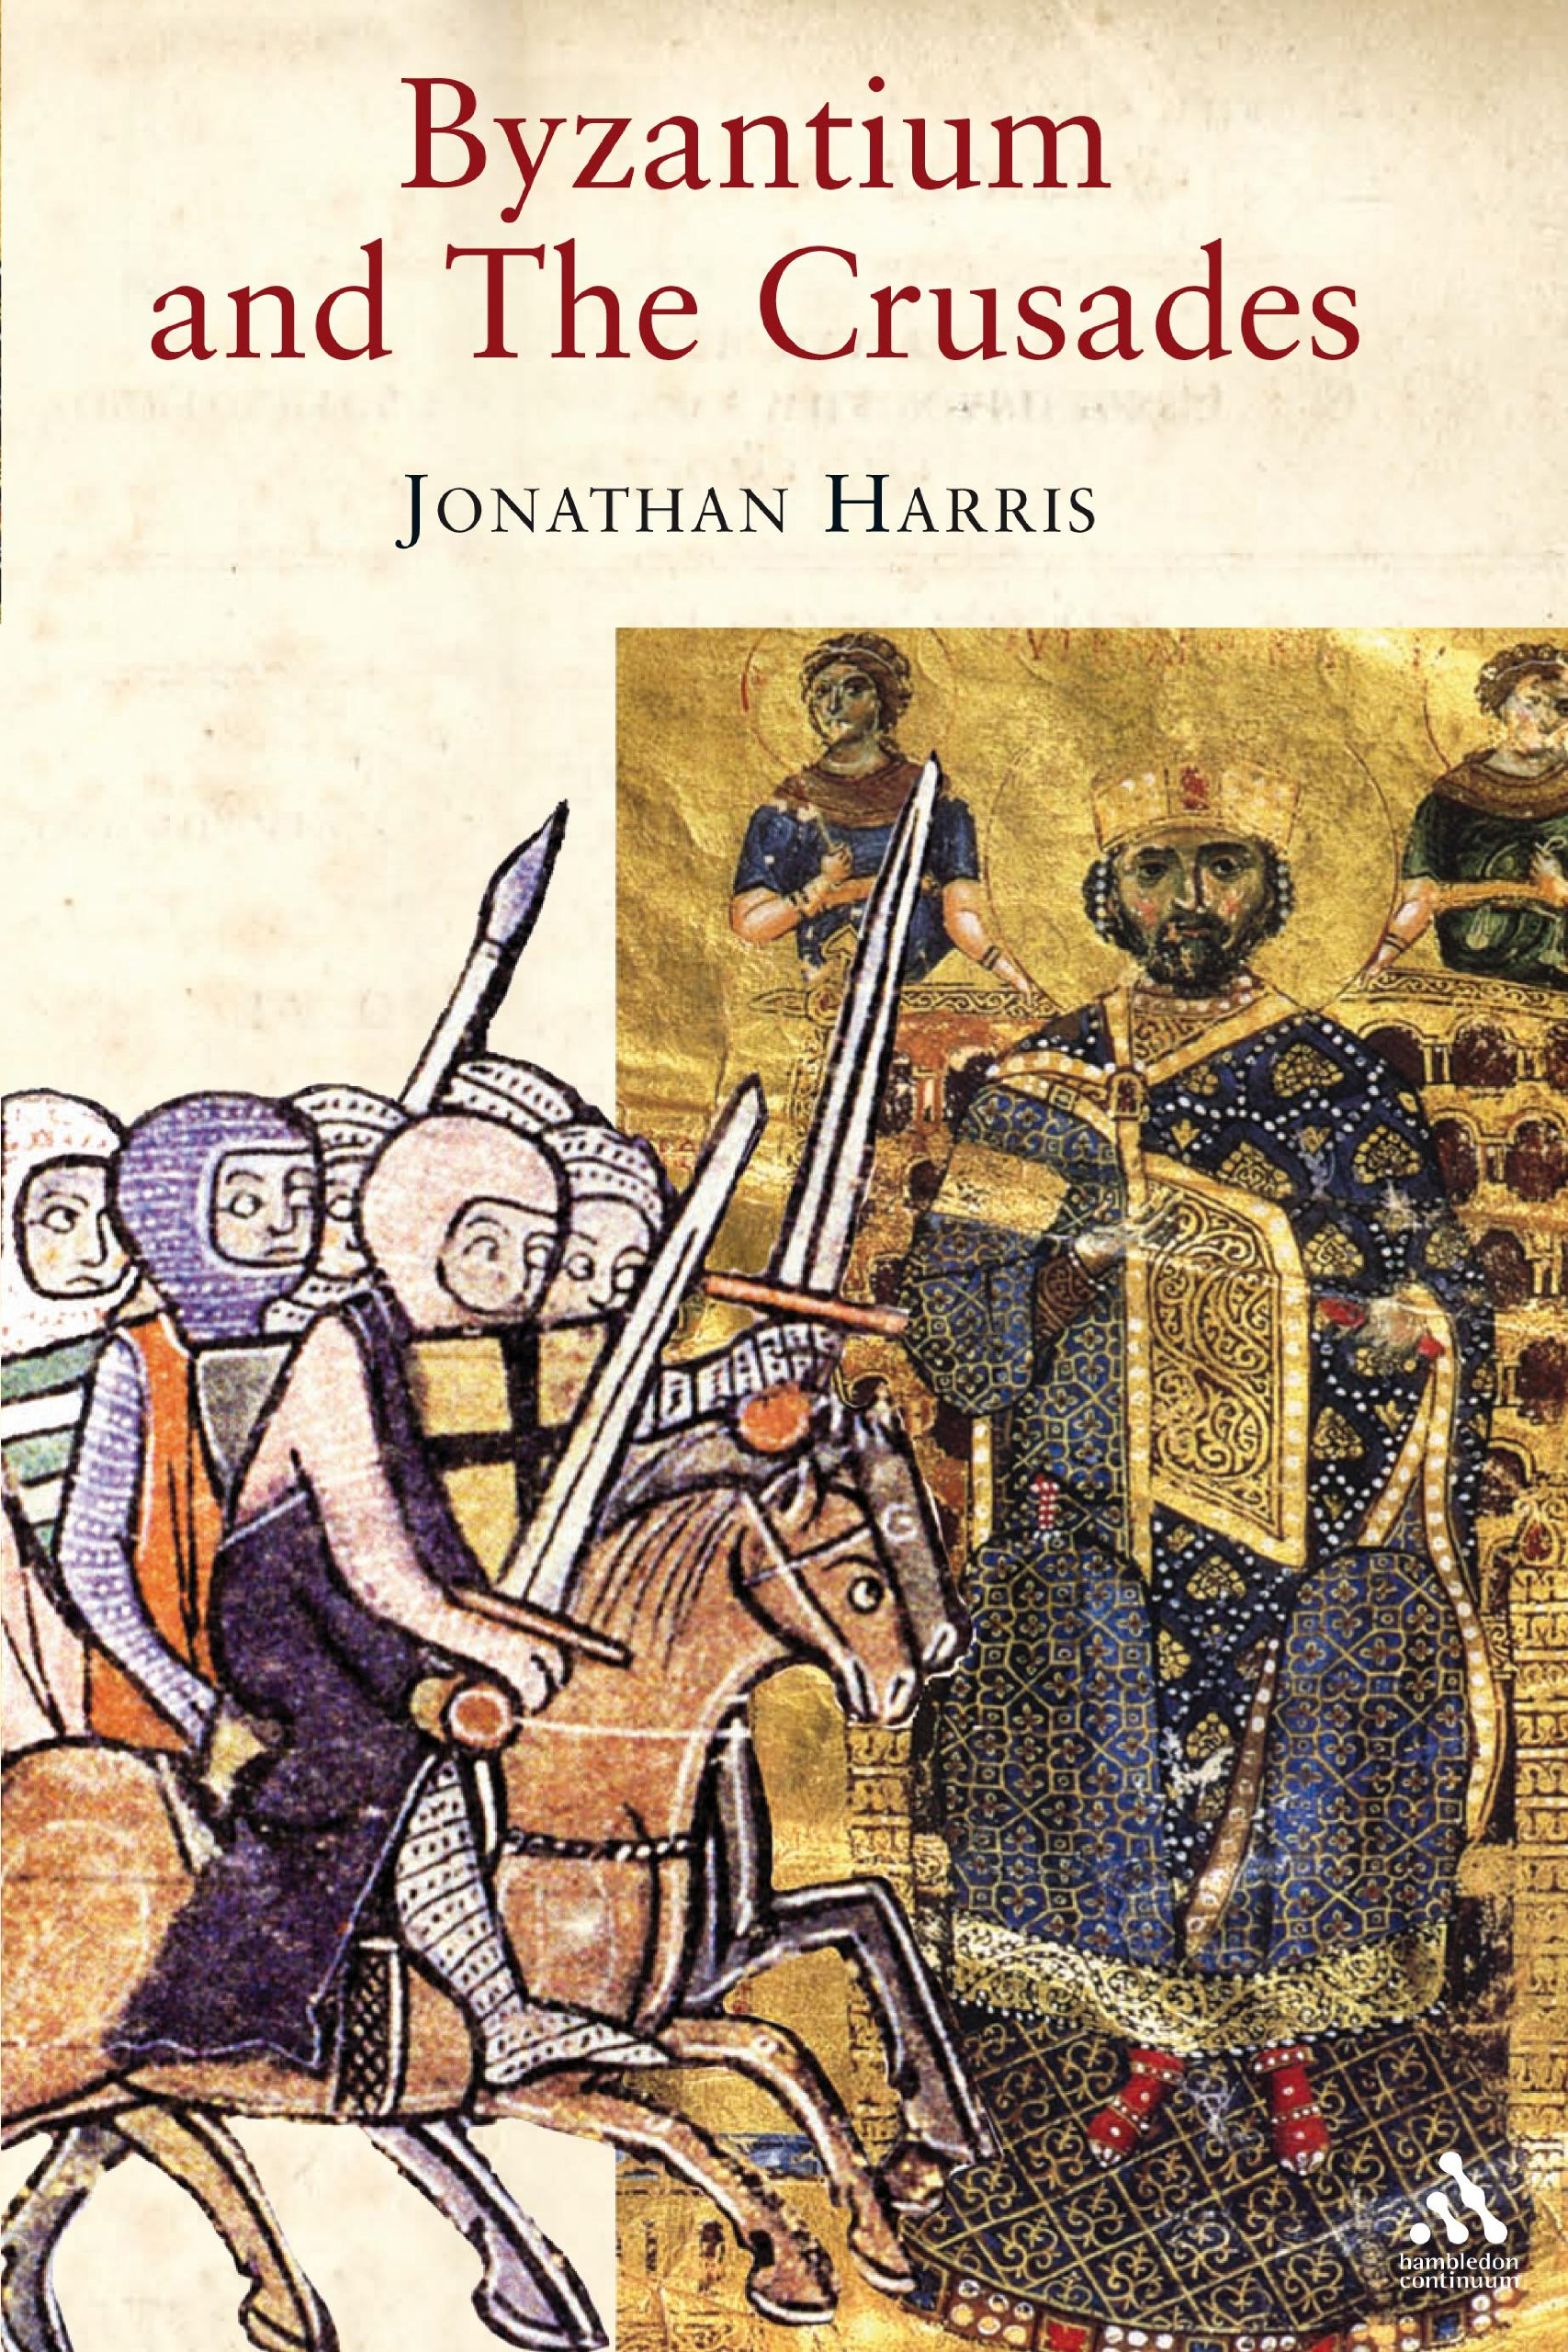 Byzantium and the Crusades (Crusader Worlds): Jonathan Harris:  9781852855017: Amazon.com: Books